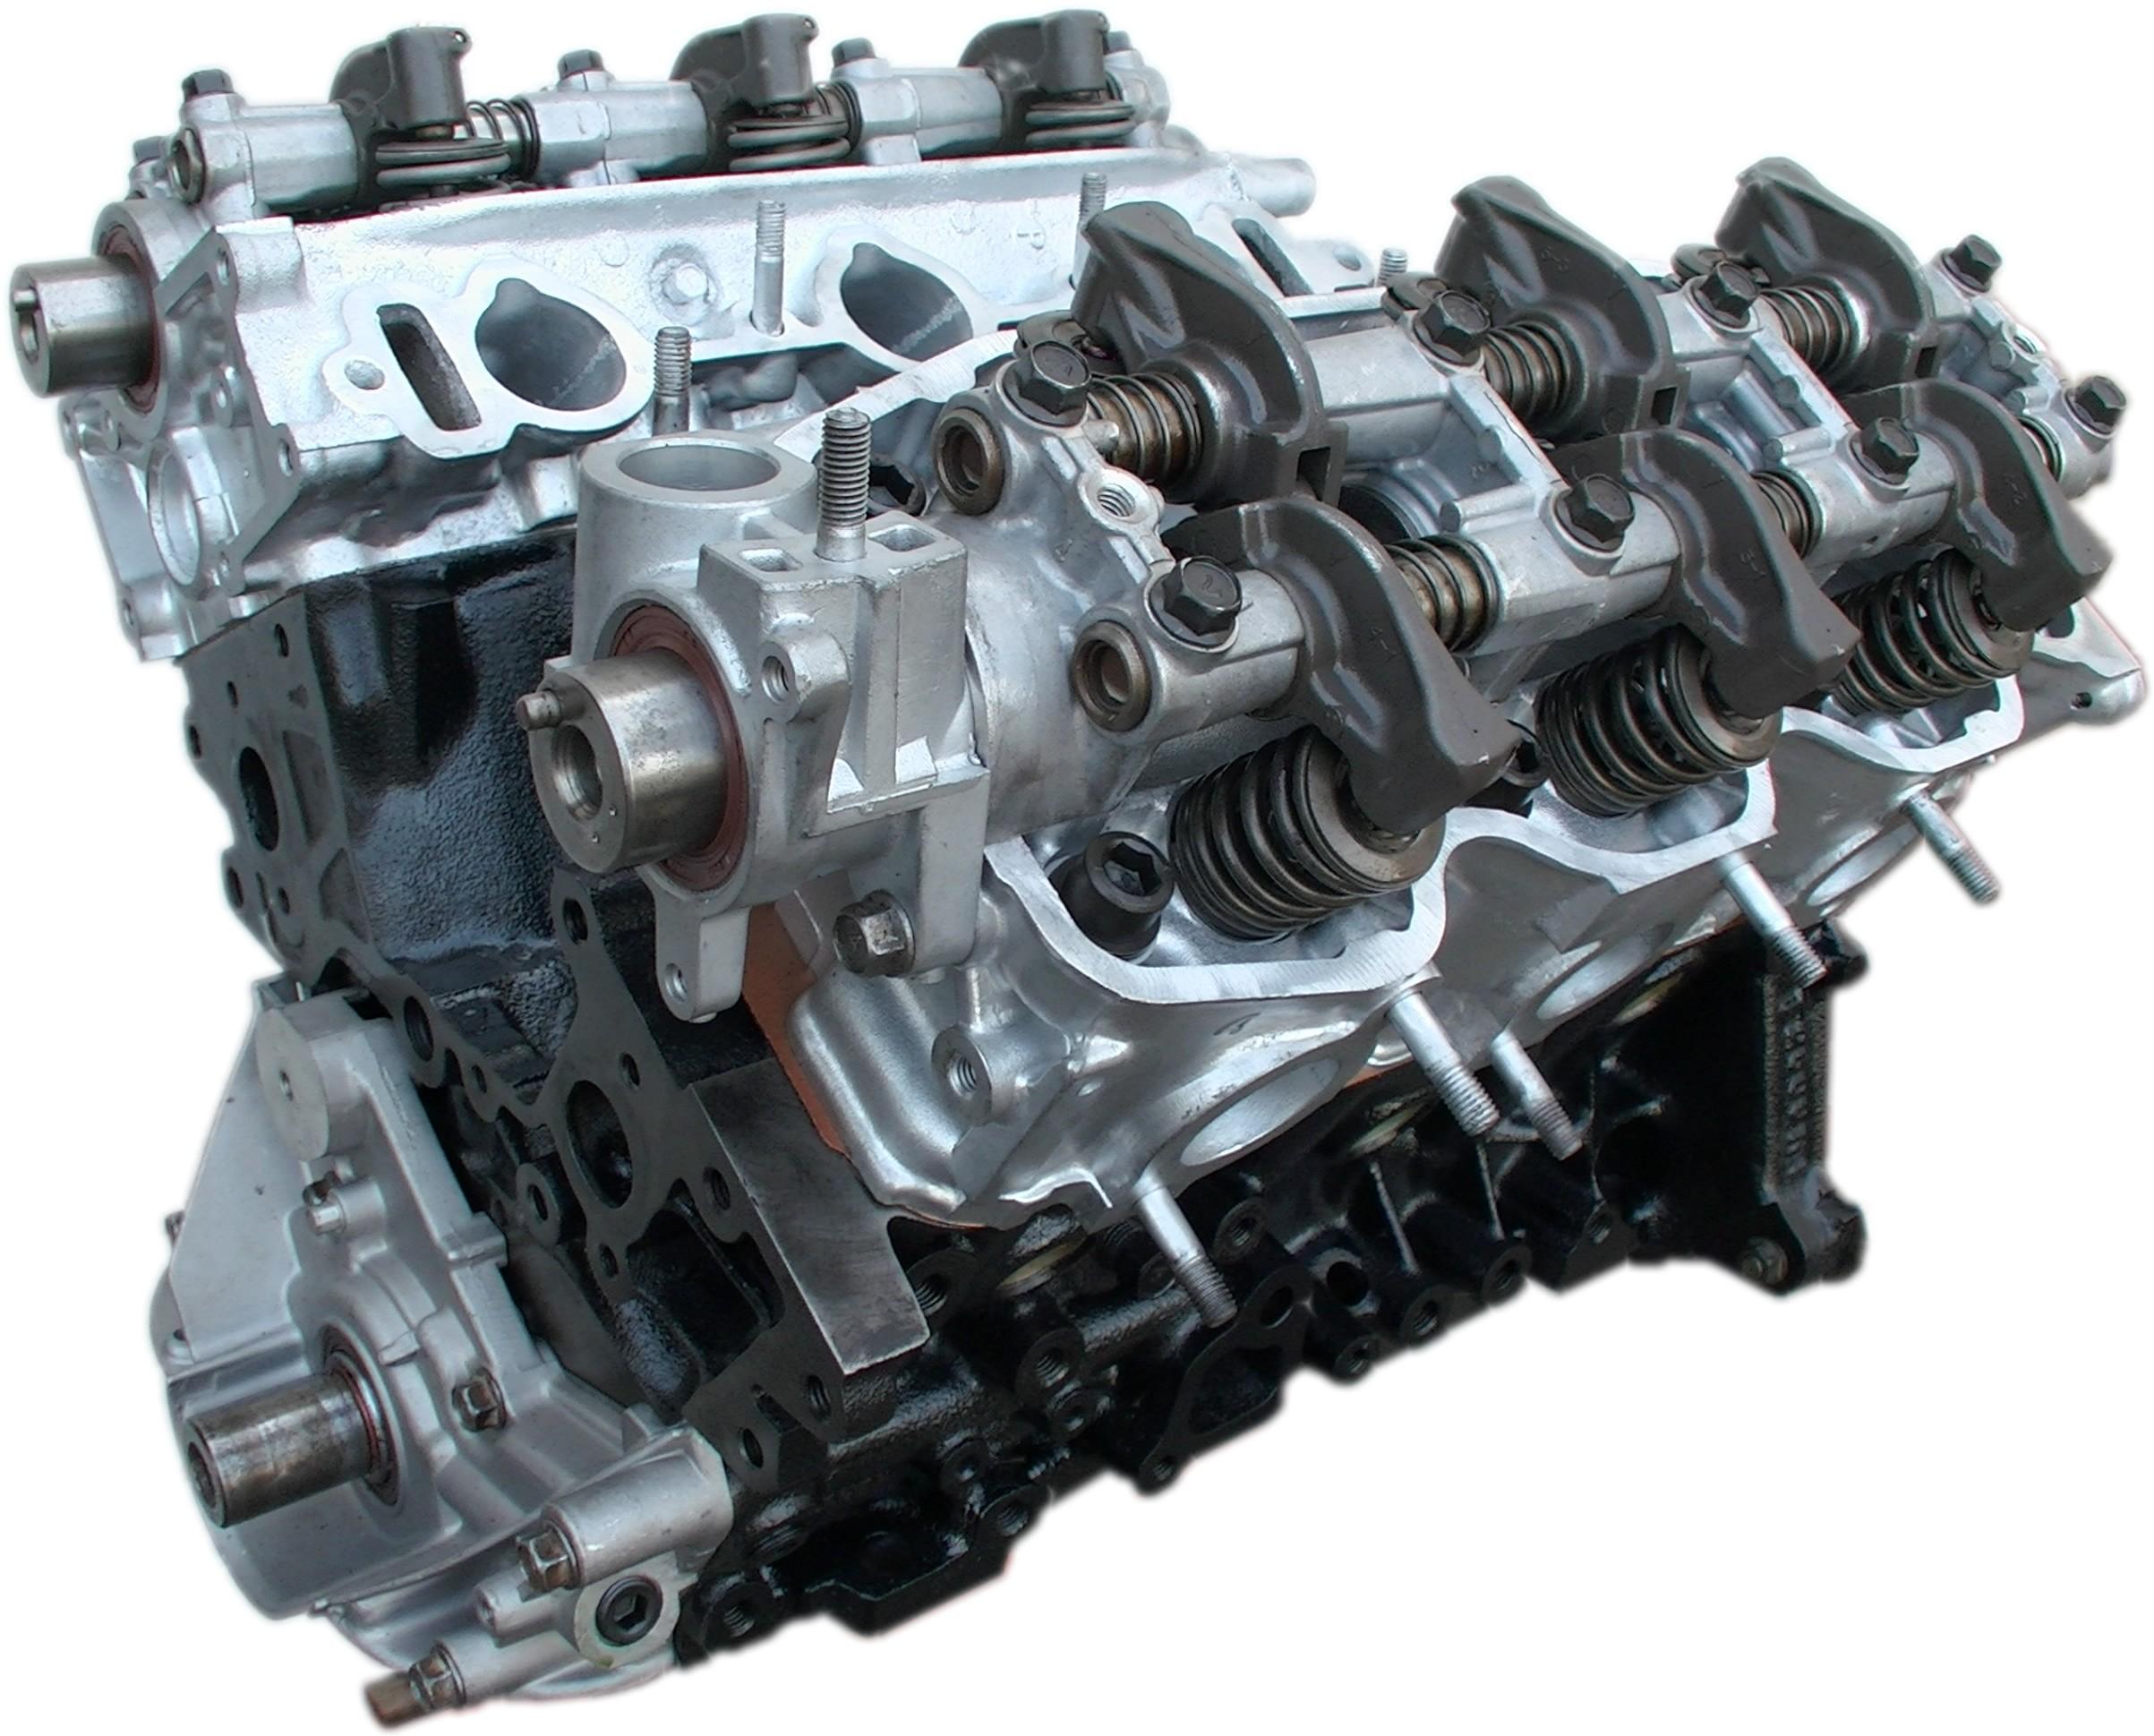 Rebuilt Chrysler Town Amp Country 6g72 3 0l Engine 171 Kar